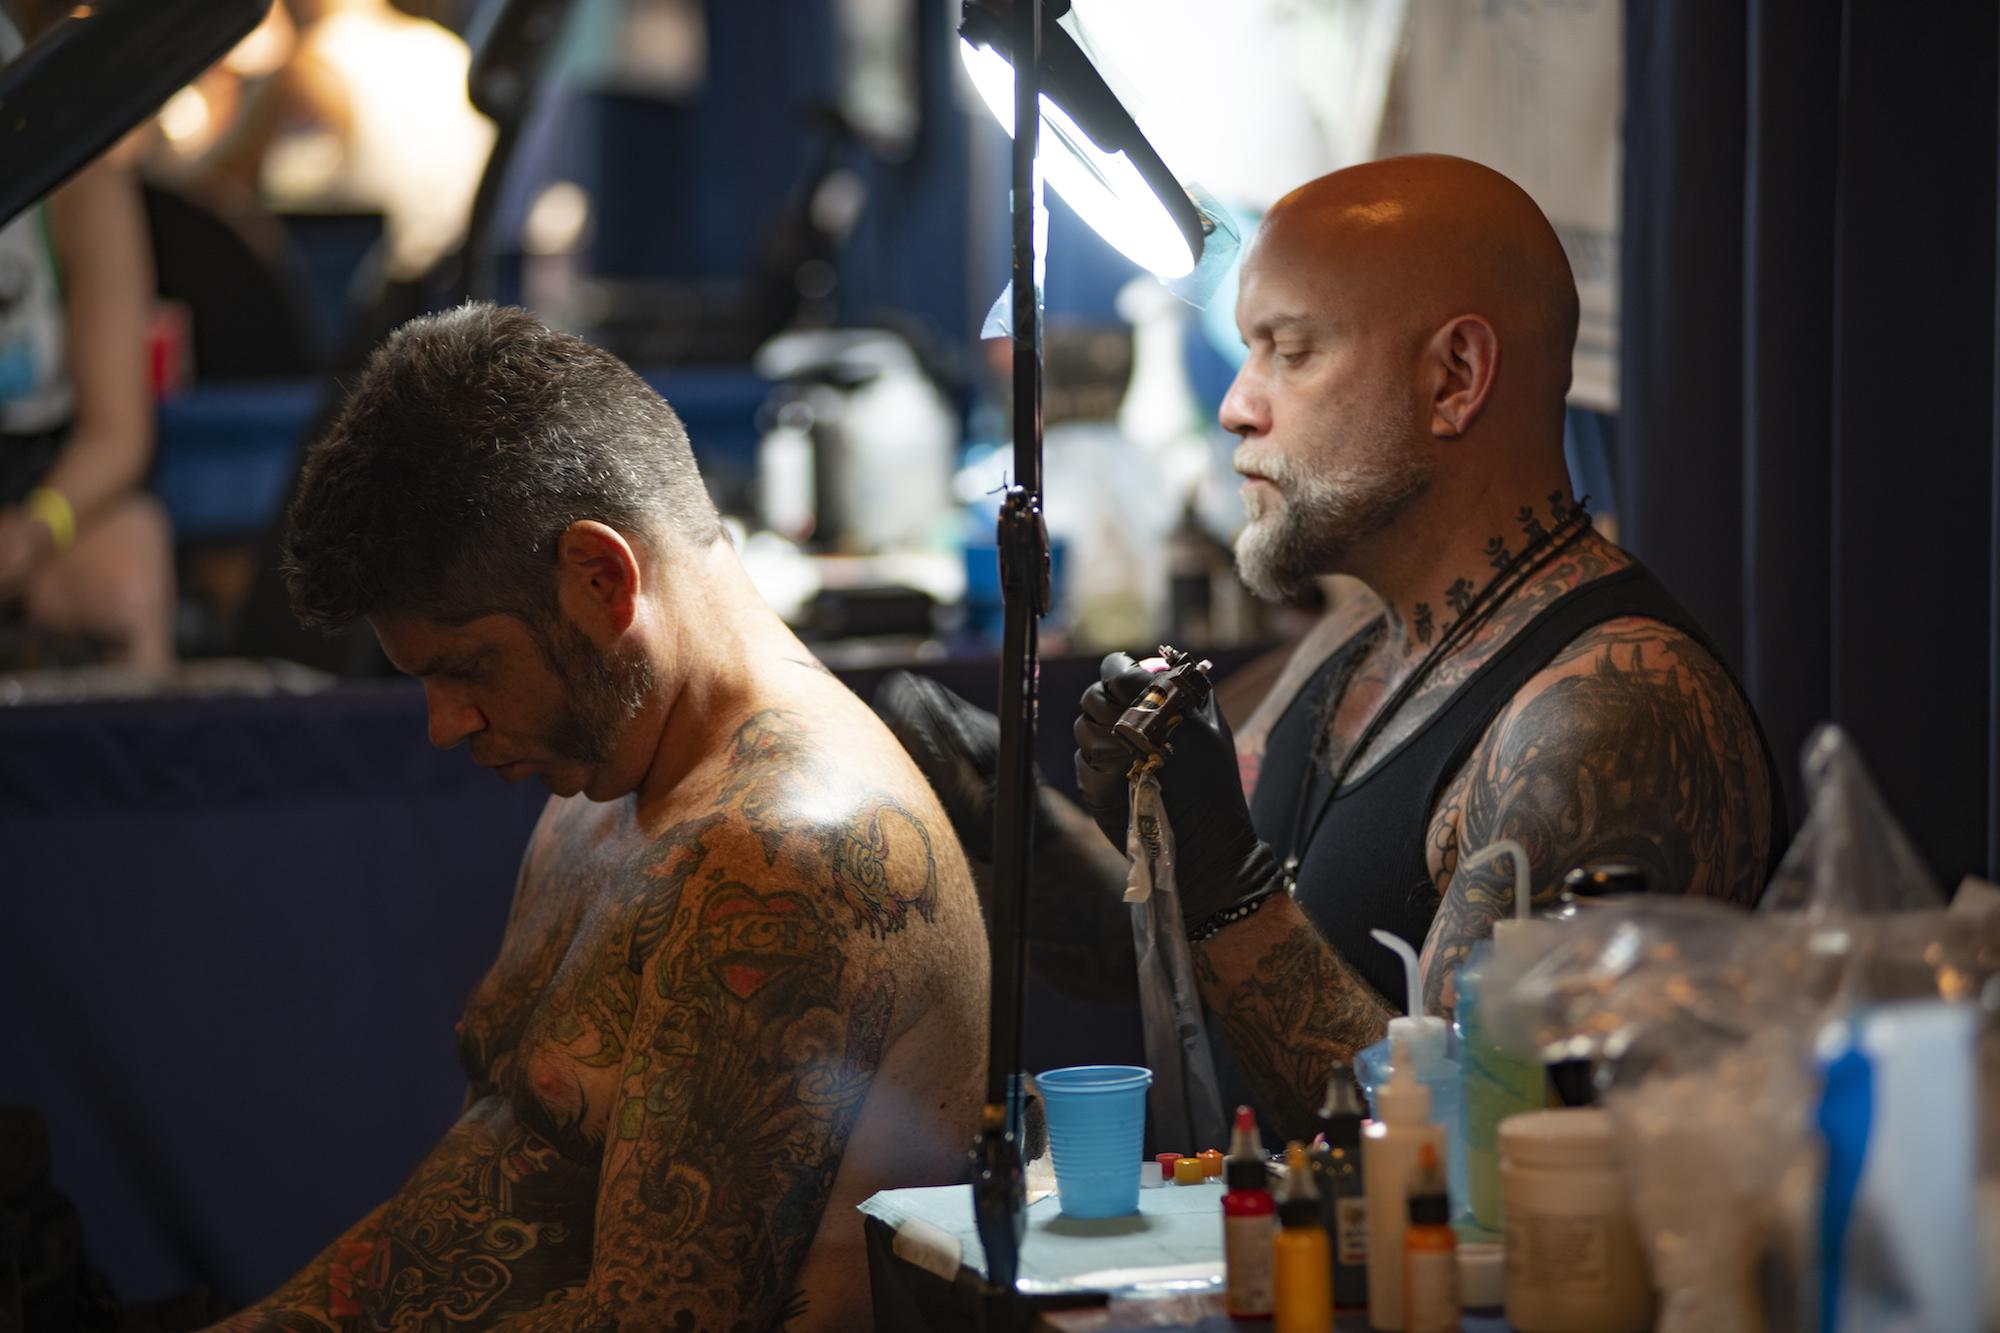 Tattoos-5872.jpg